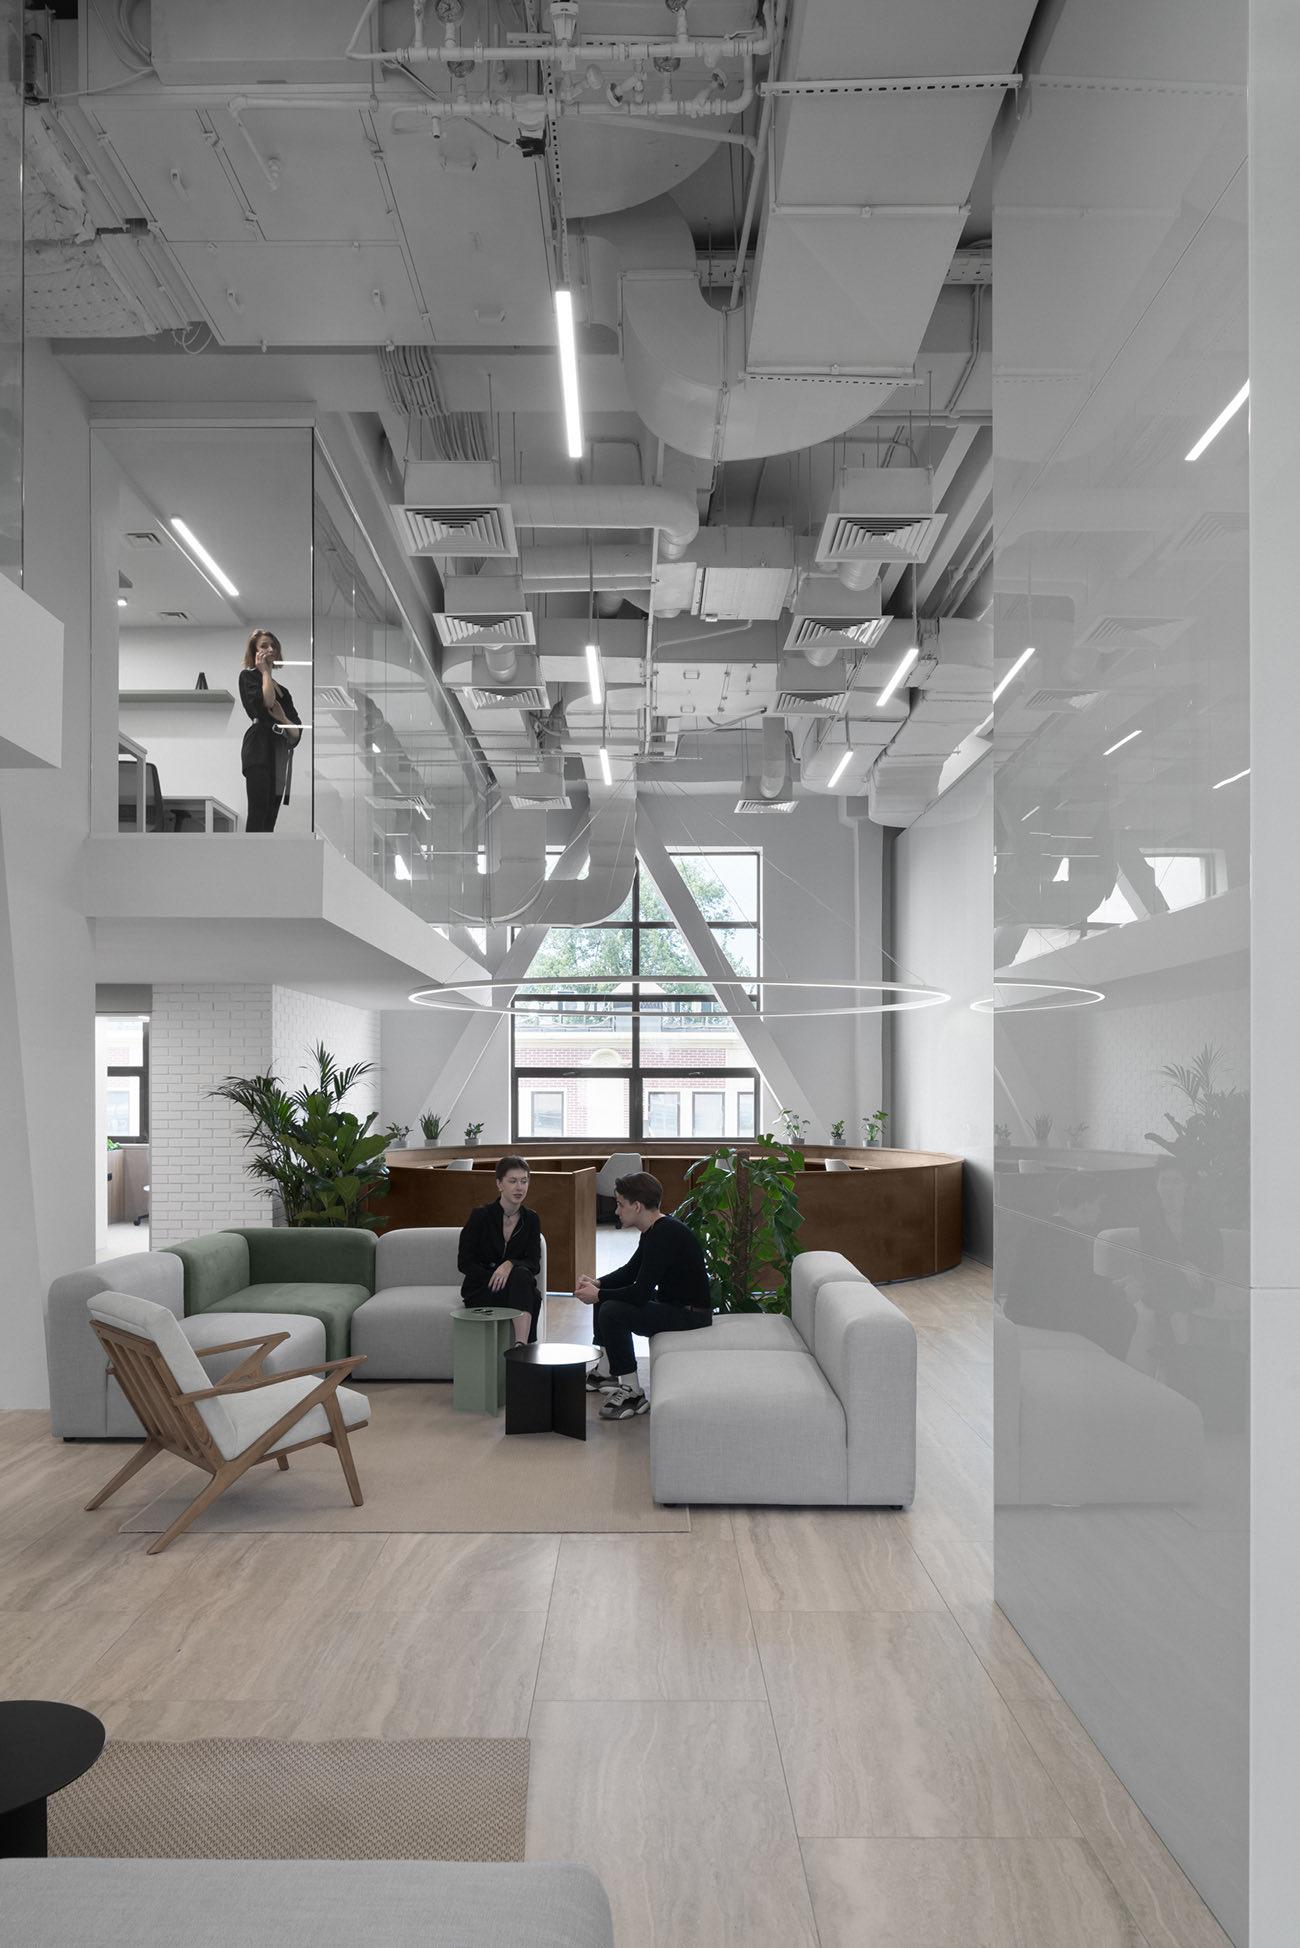 praktik-coworking-space-minsk-11